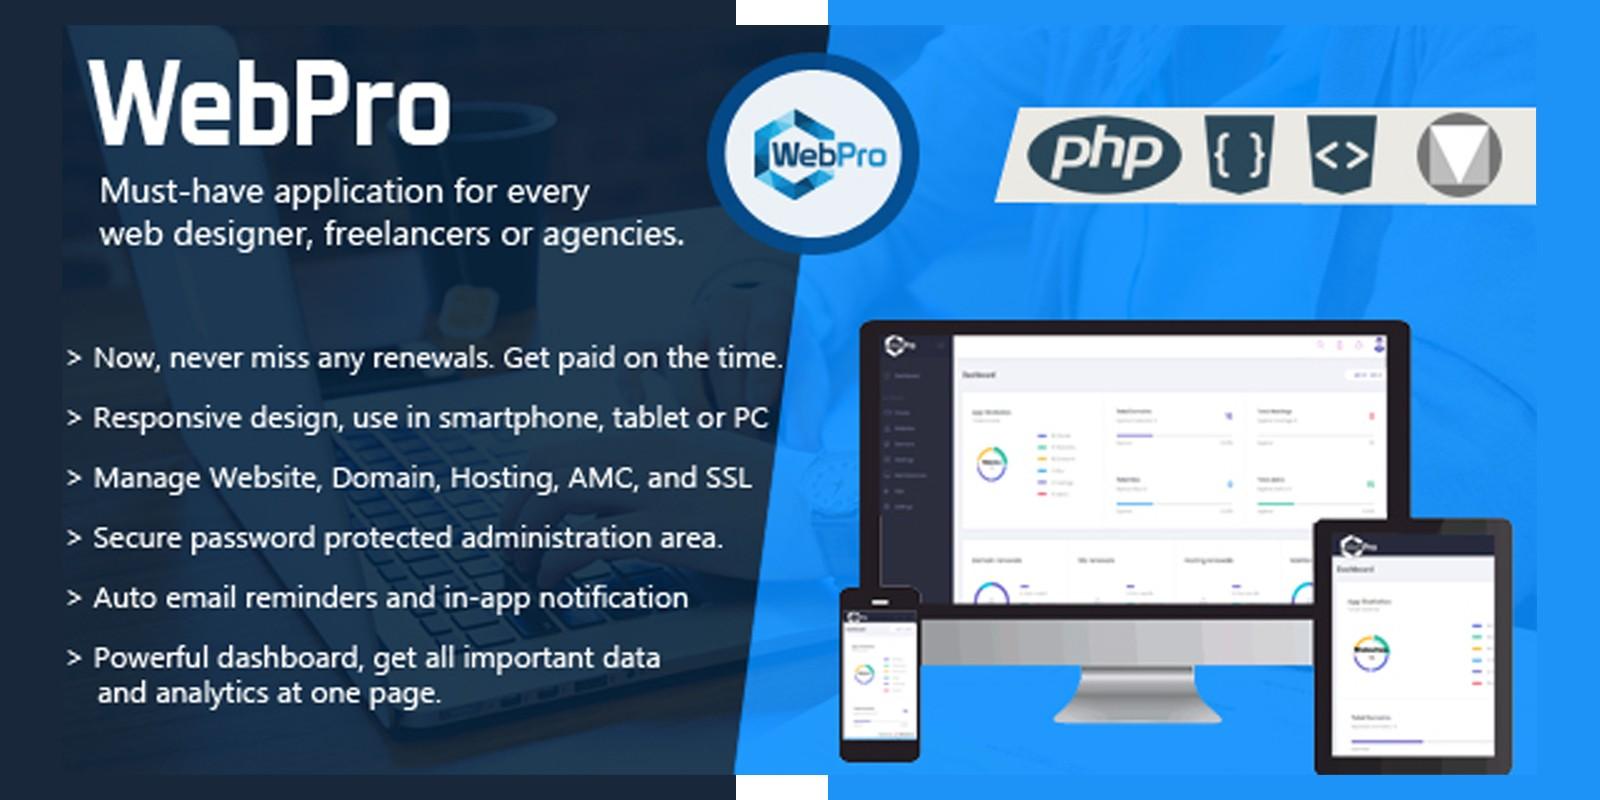 WebPro - Digital Services Management Application